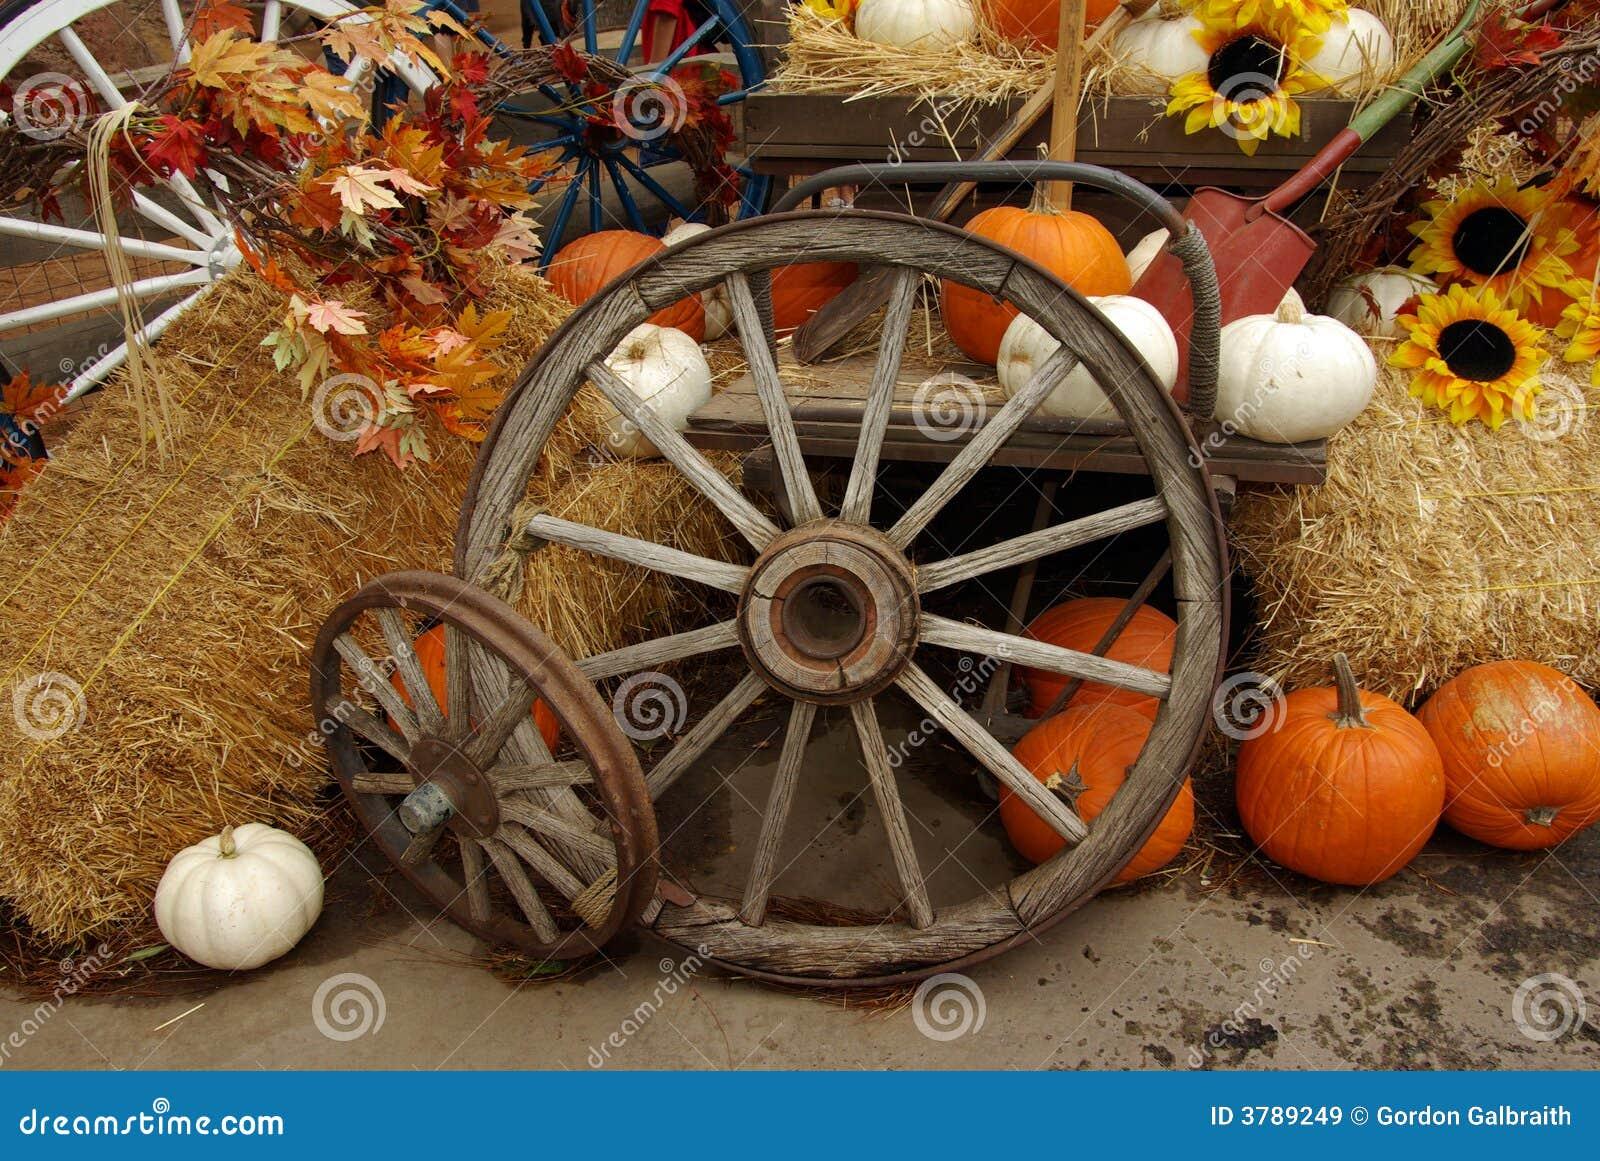 Harvest Scene Stock Image Image Of Vintage Fall Wagon 3789249